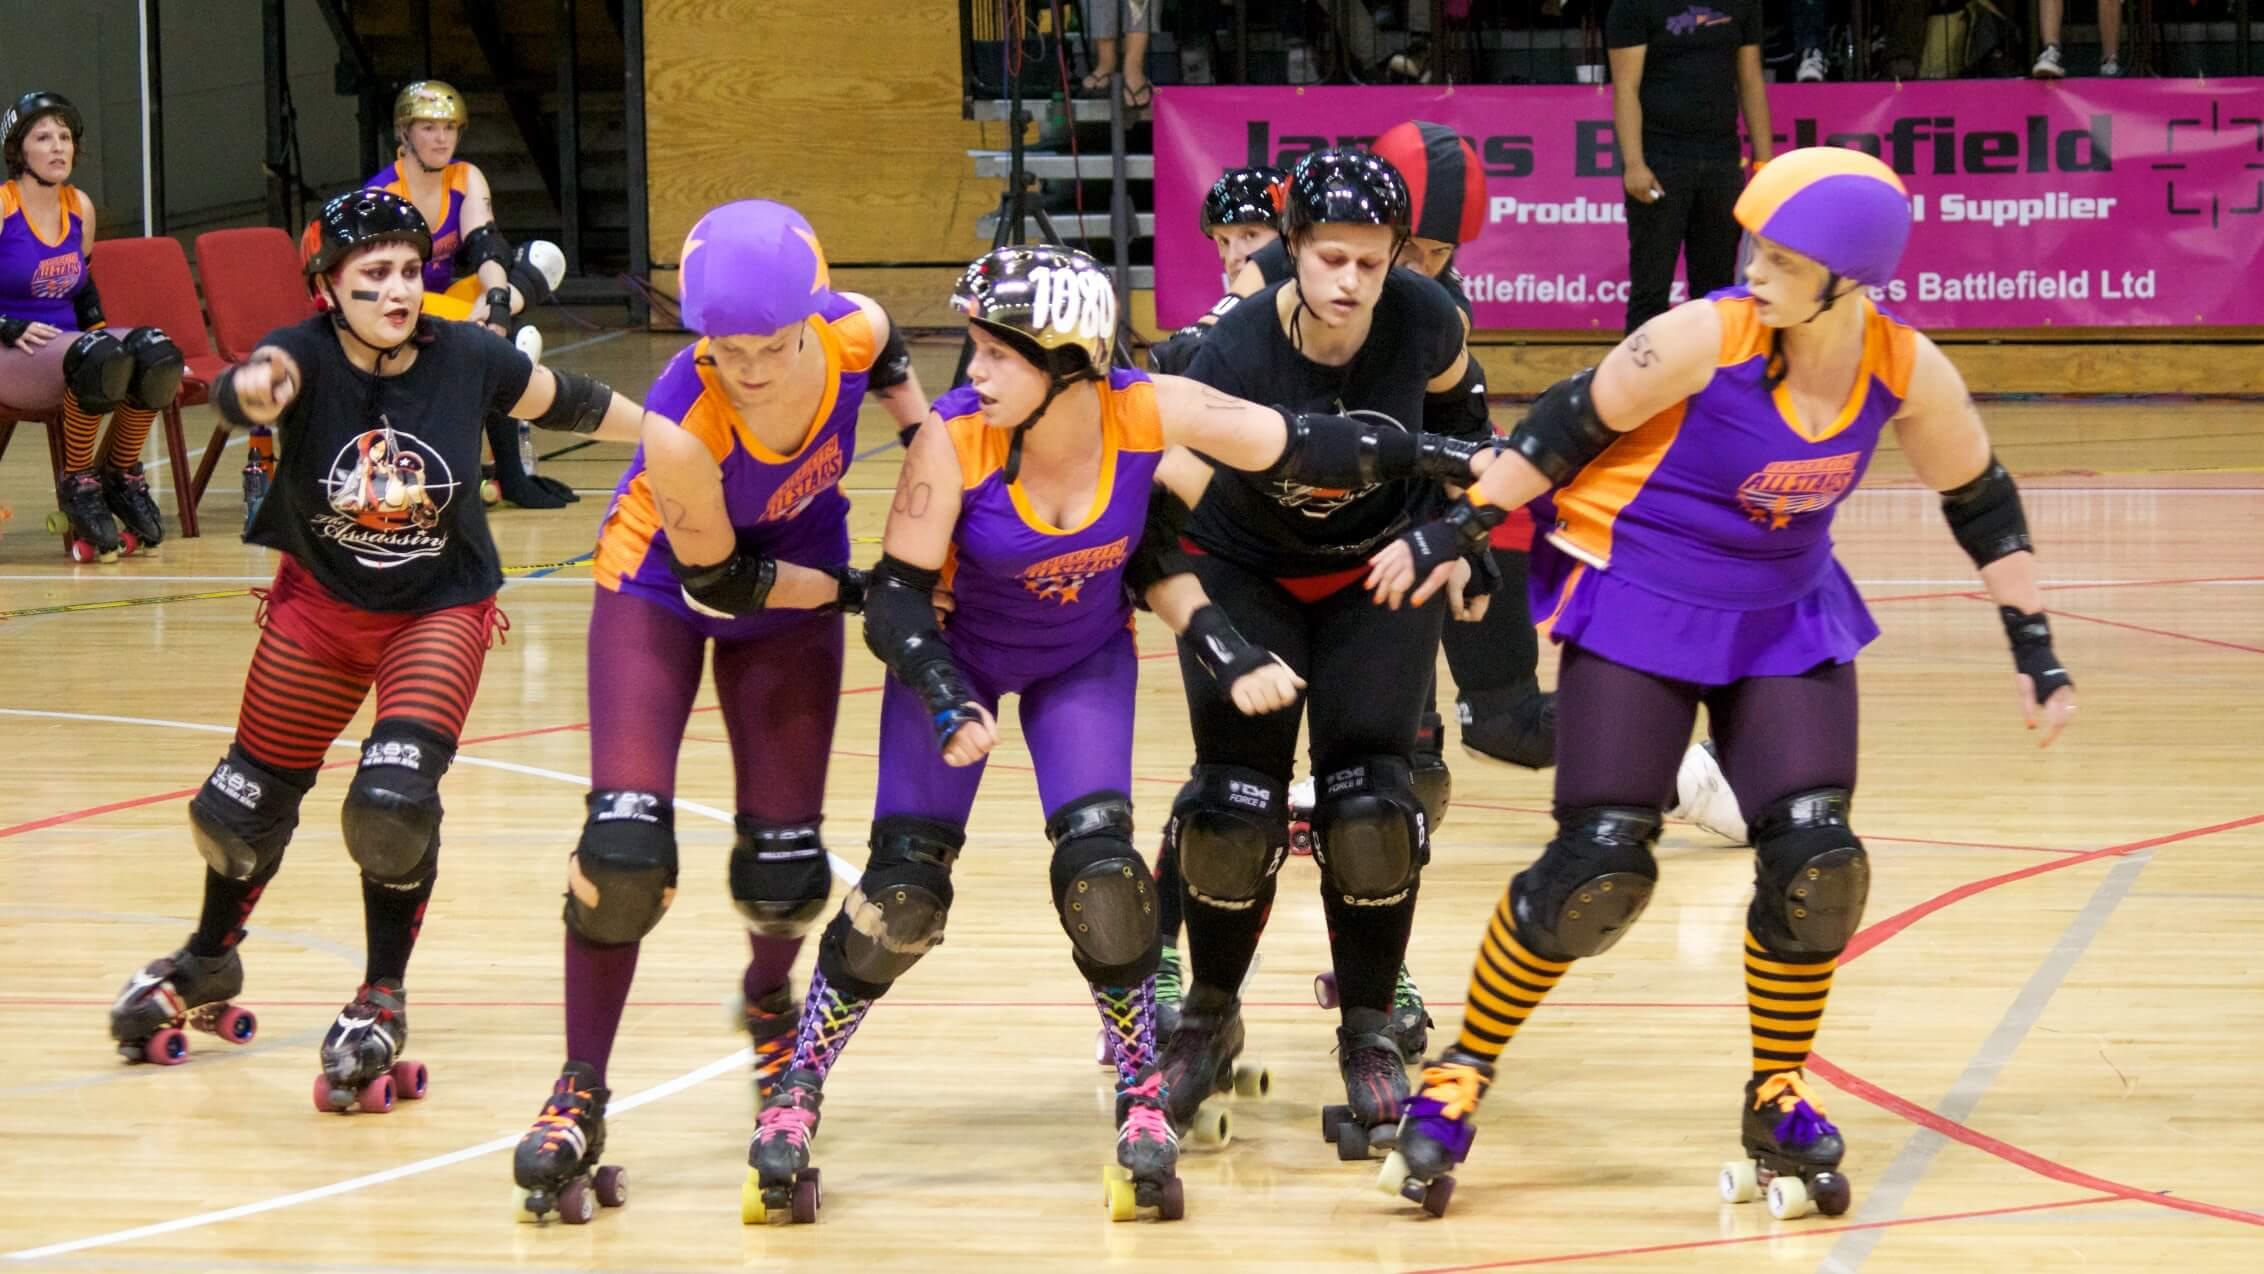 Roller skating derby - Roller Derby Bout Wellington S Richter City All Stars Vs Sydney S Assassins At The Tsb Bank